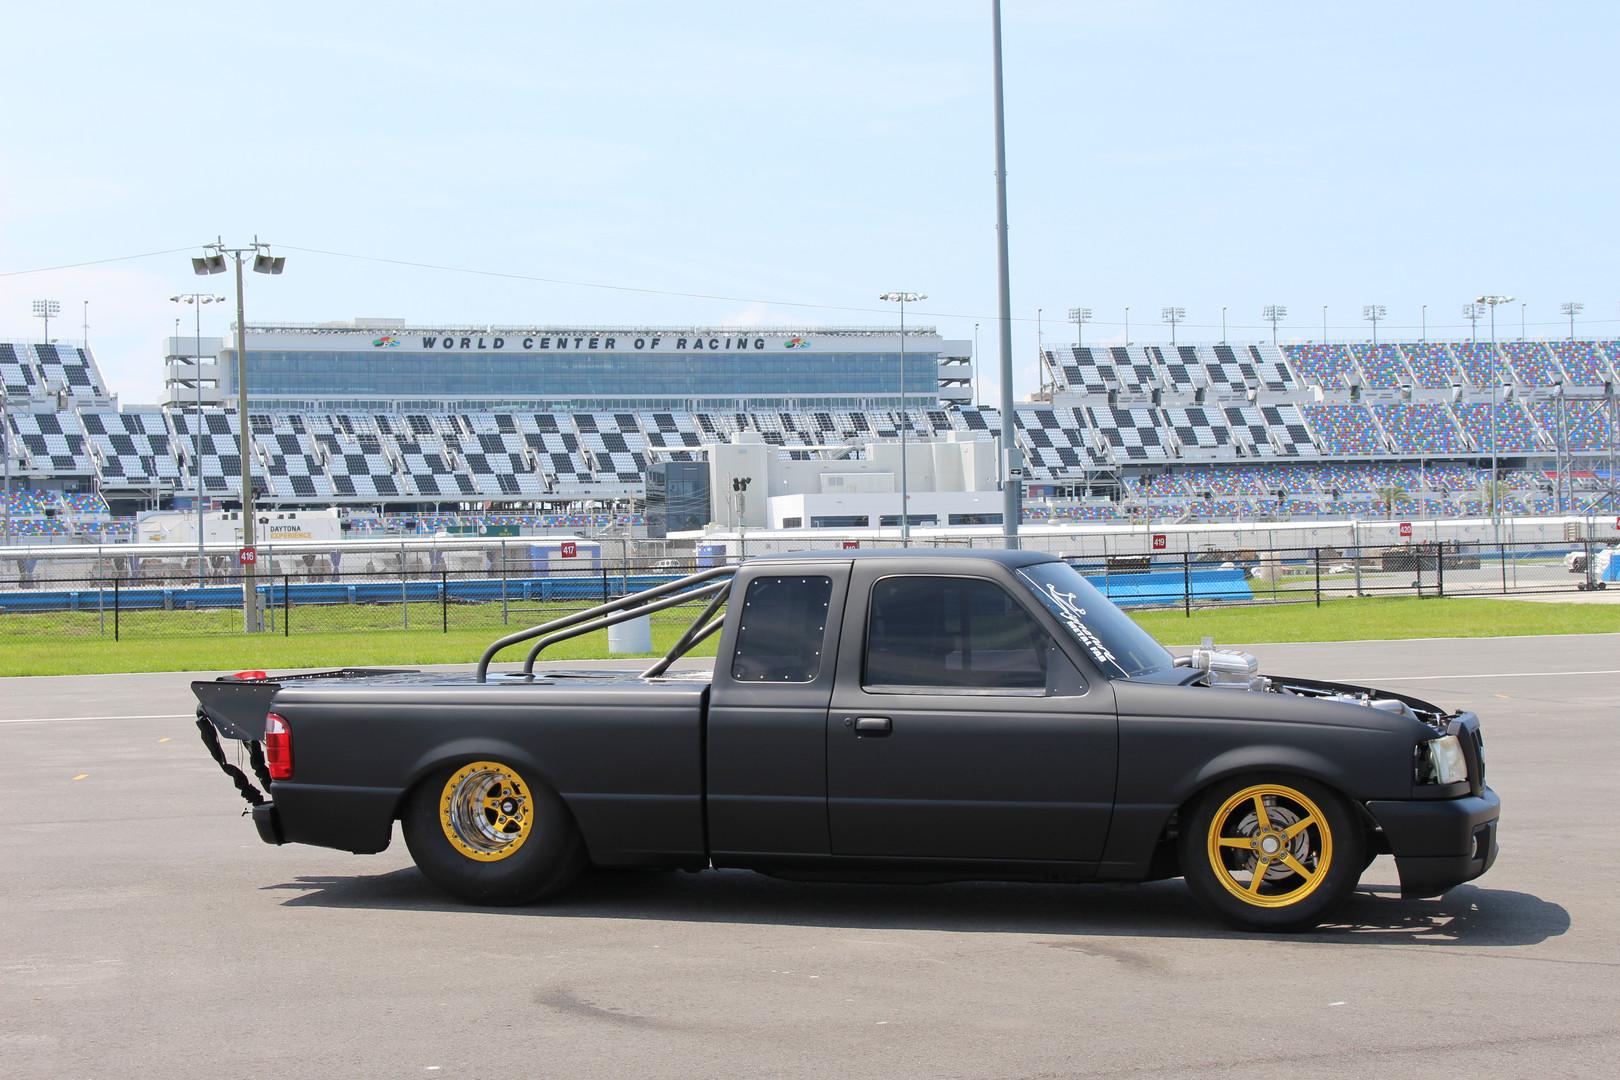 Johnnys Ranger at Daytona